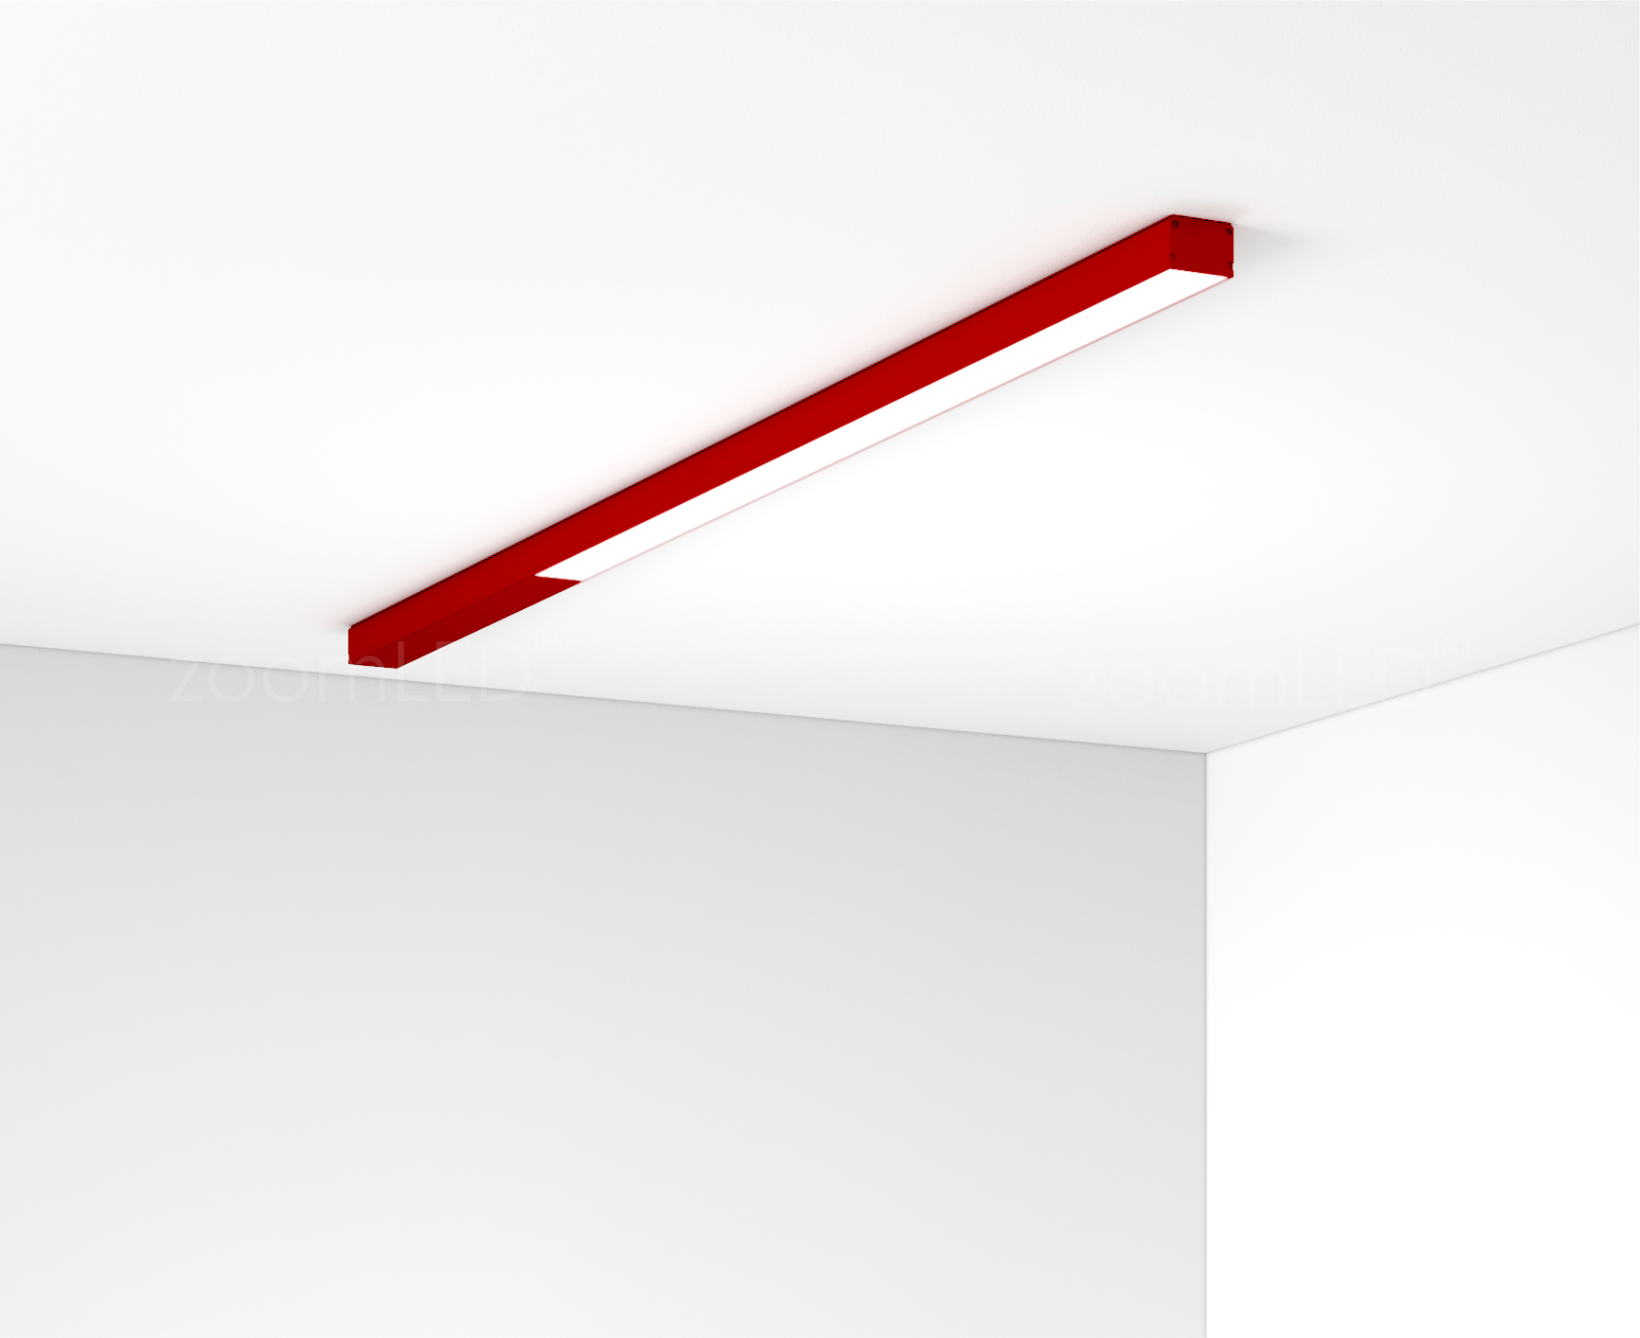 120cm_czerwona_lampa_biurowa_liniowa_led_natynkowa_sufitowa